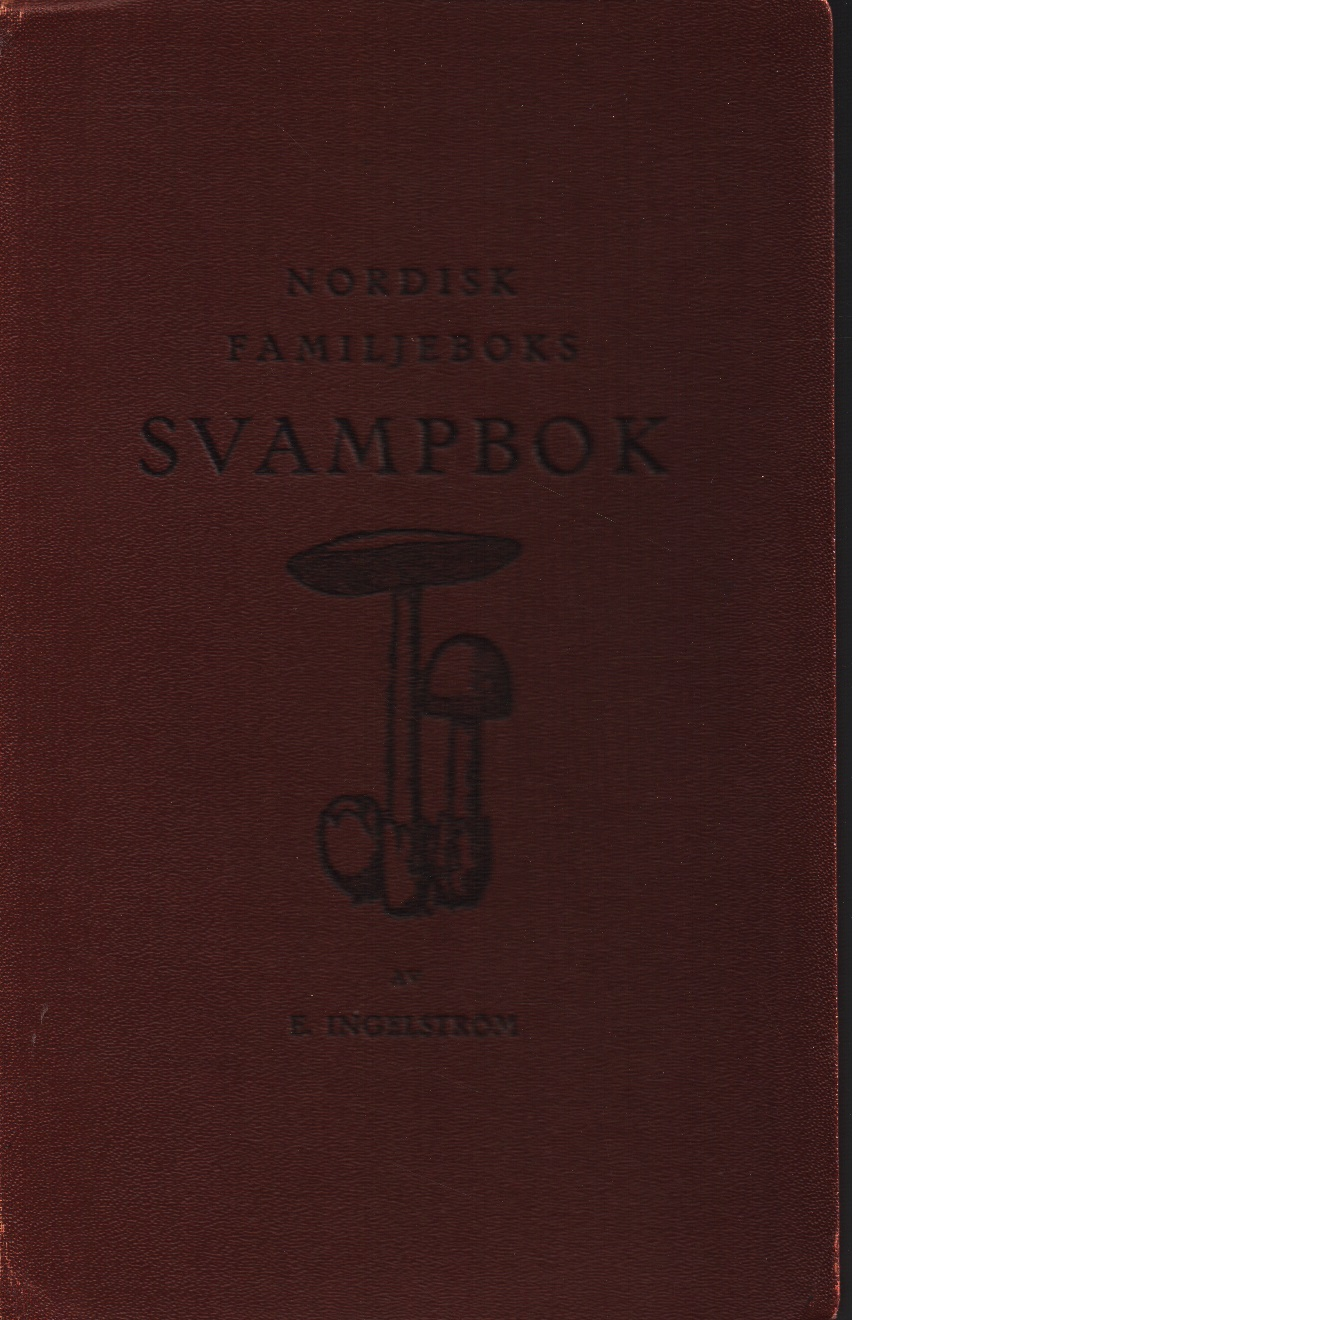 Nordisk familjeboks svampbok : 44 lektioner i svampkunskap - Ingelström, Einar Andreas